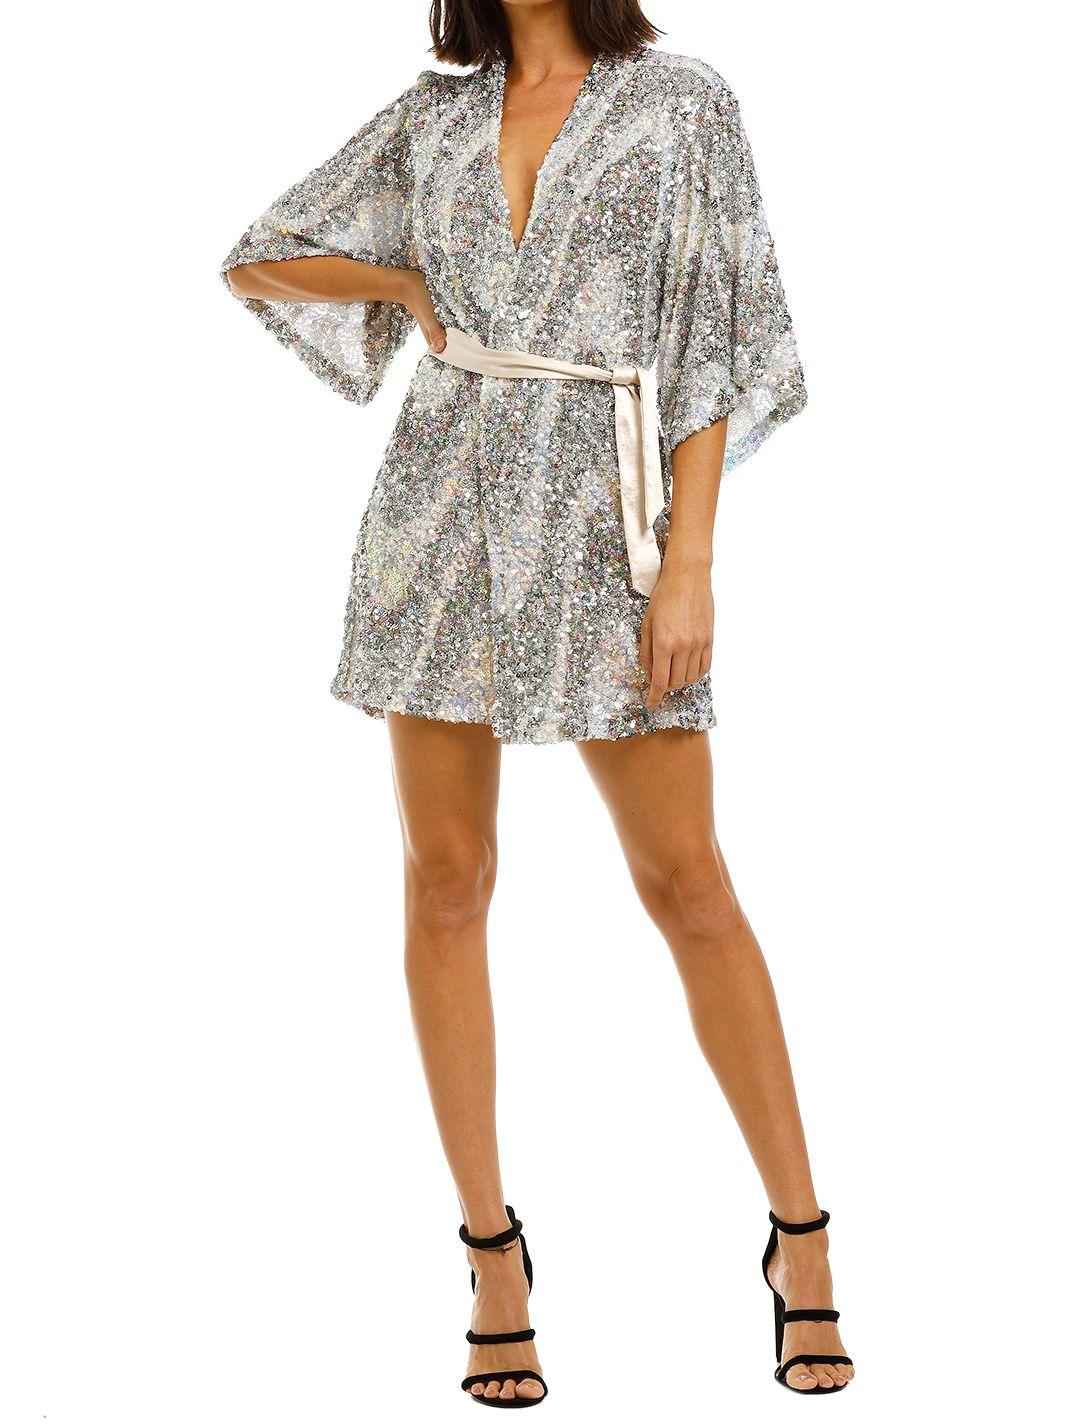 Winona-Rhapsody-Wrap-Dress-Multi-Front